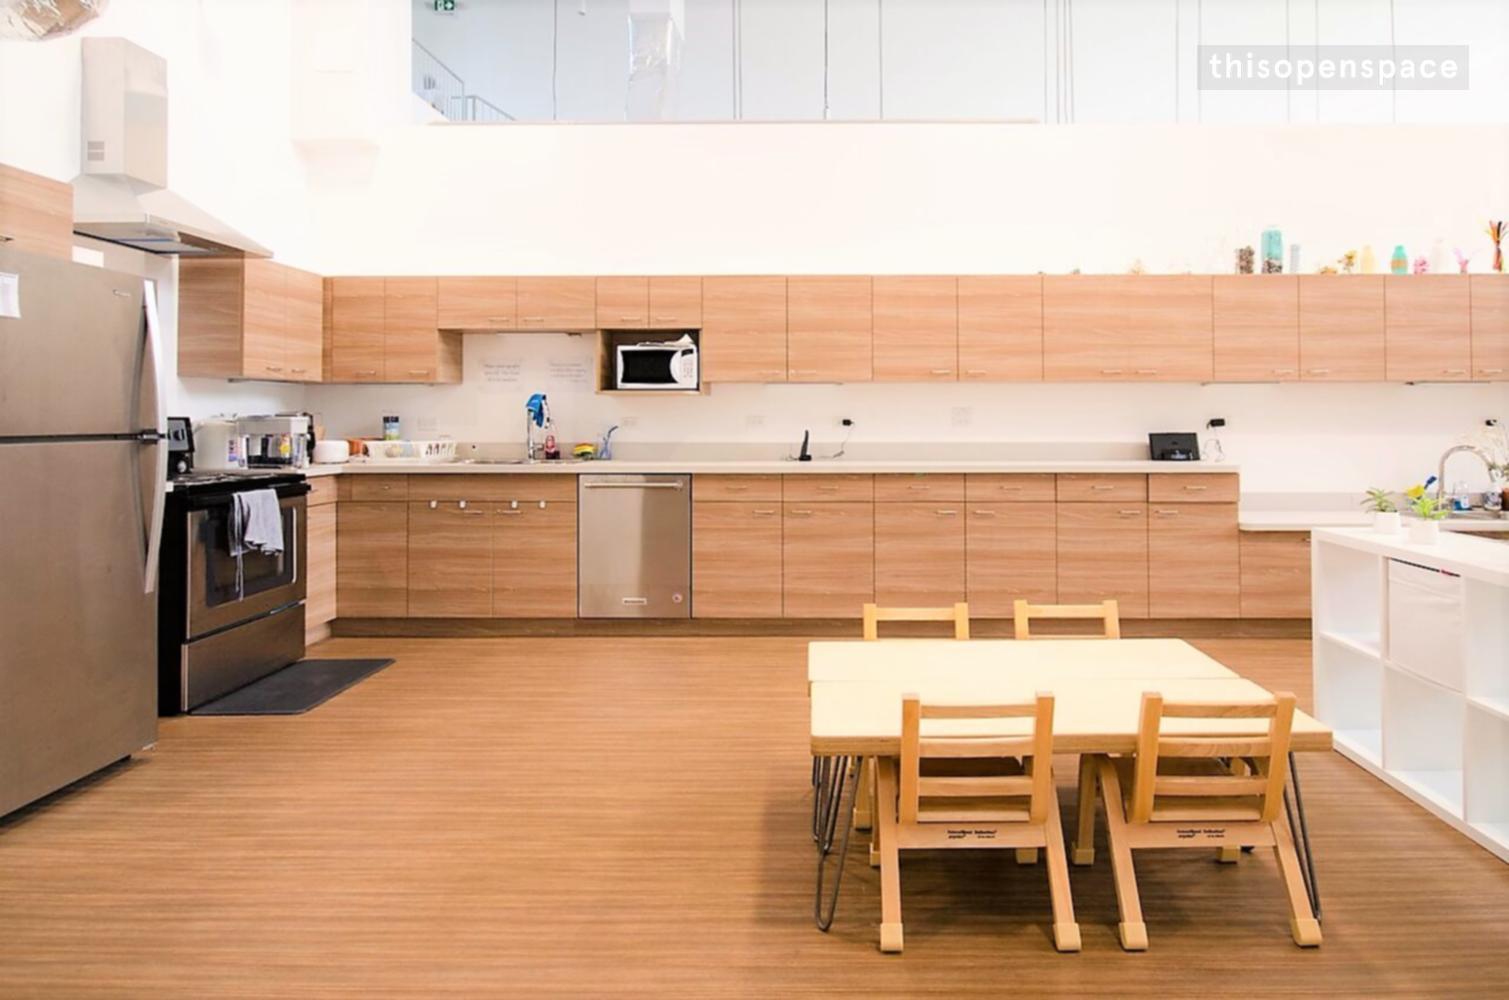 Thisopenspace Bright Multipurpose Studio Space In East Side Vancouver British Columbia